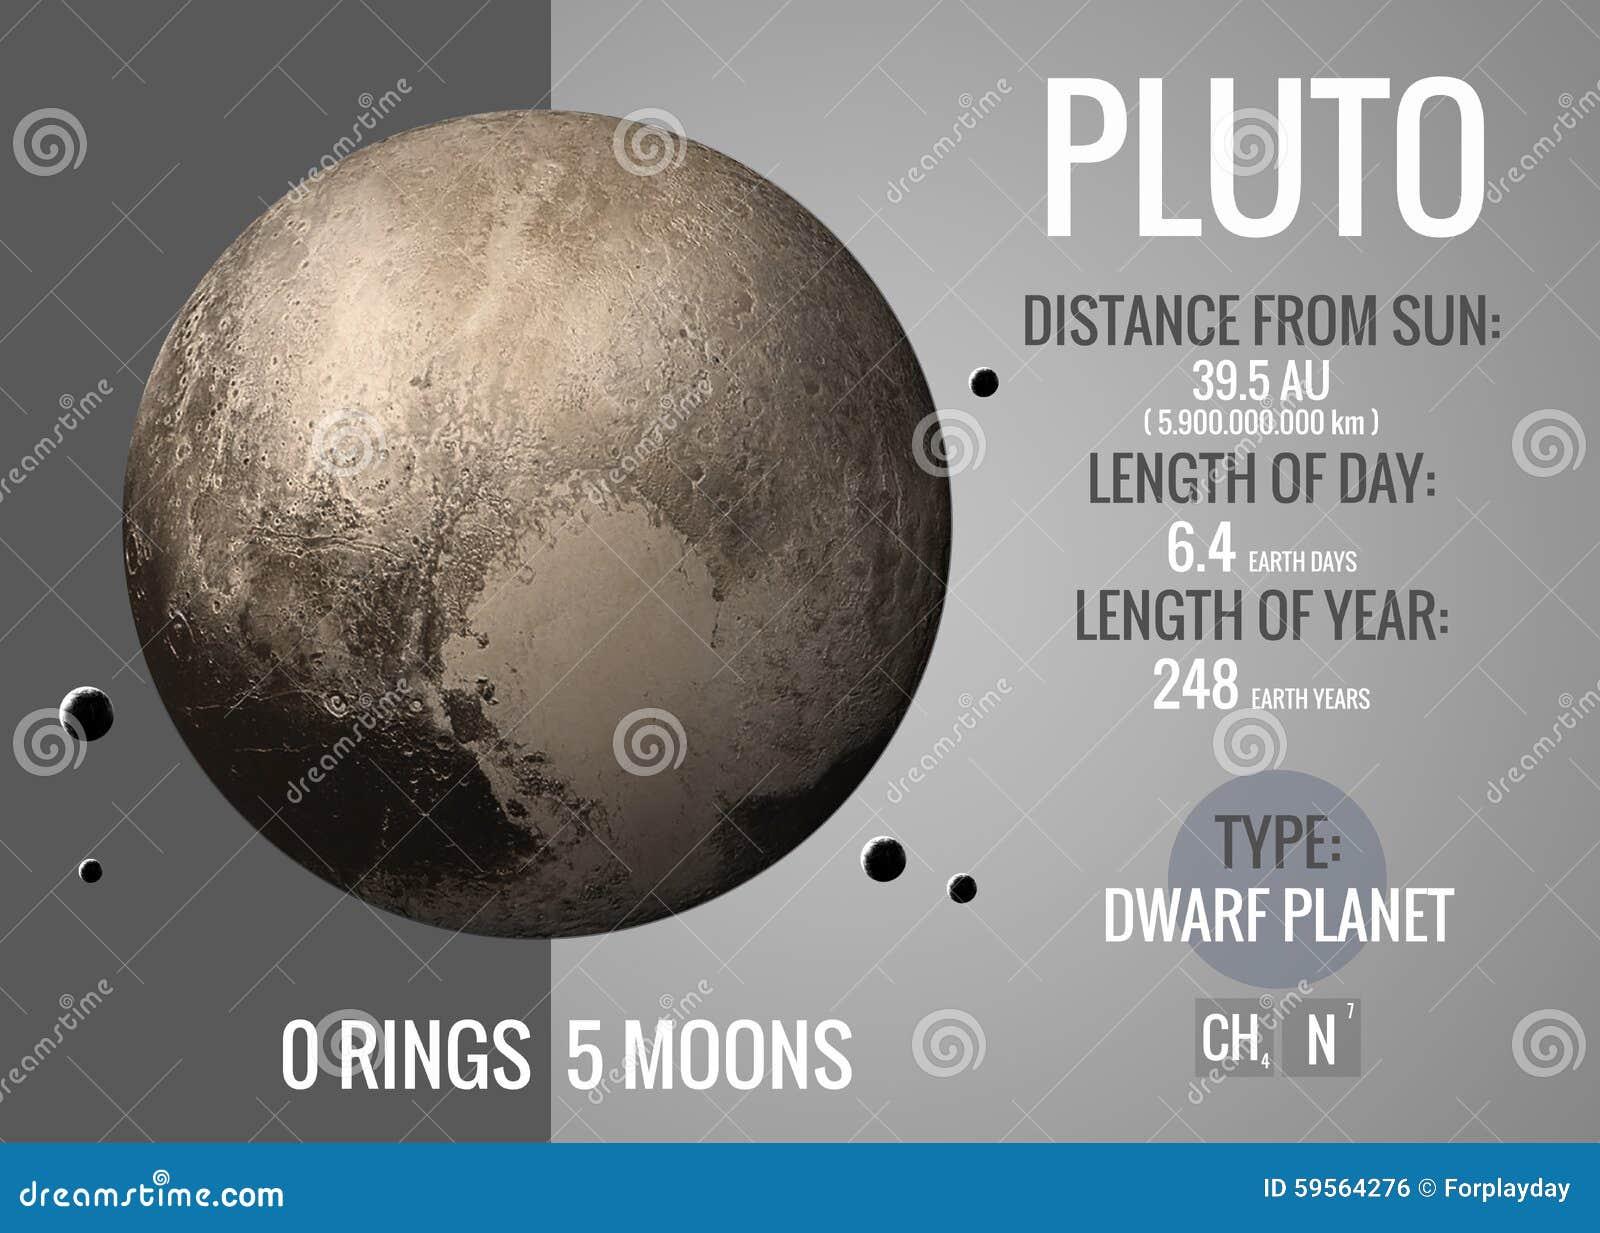 elements present on planet pluto - photo #4